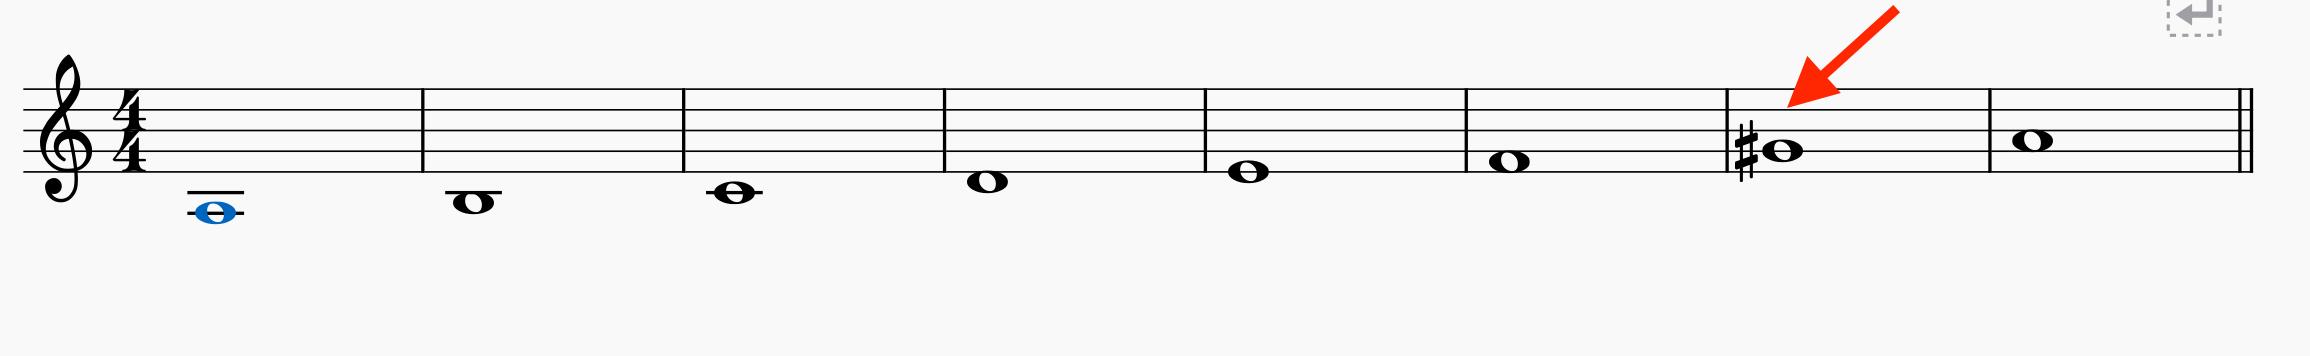 イ短調の和声短音階